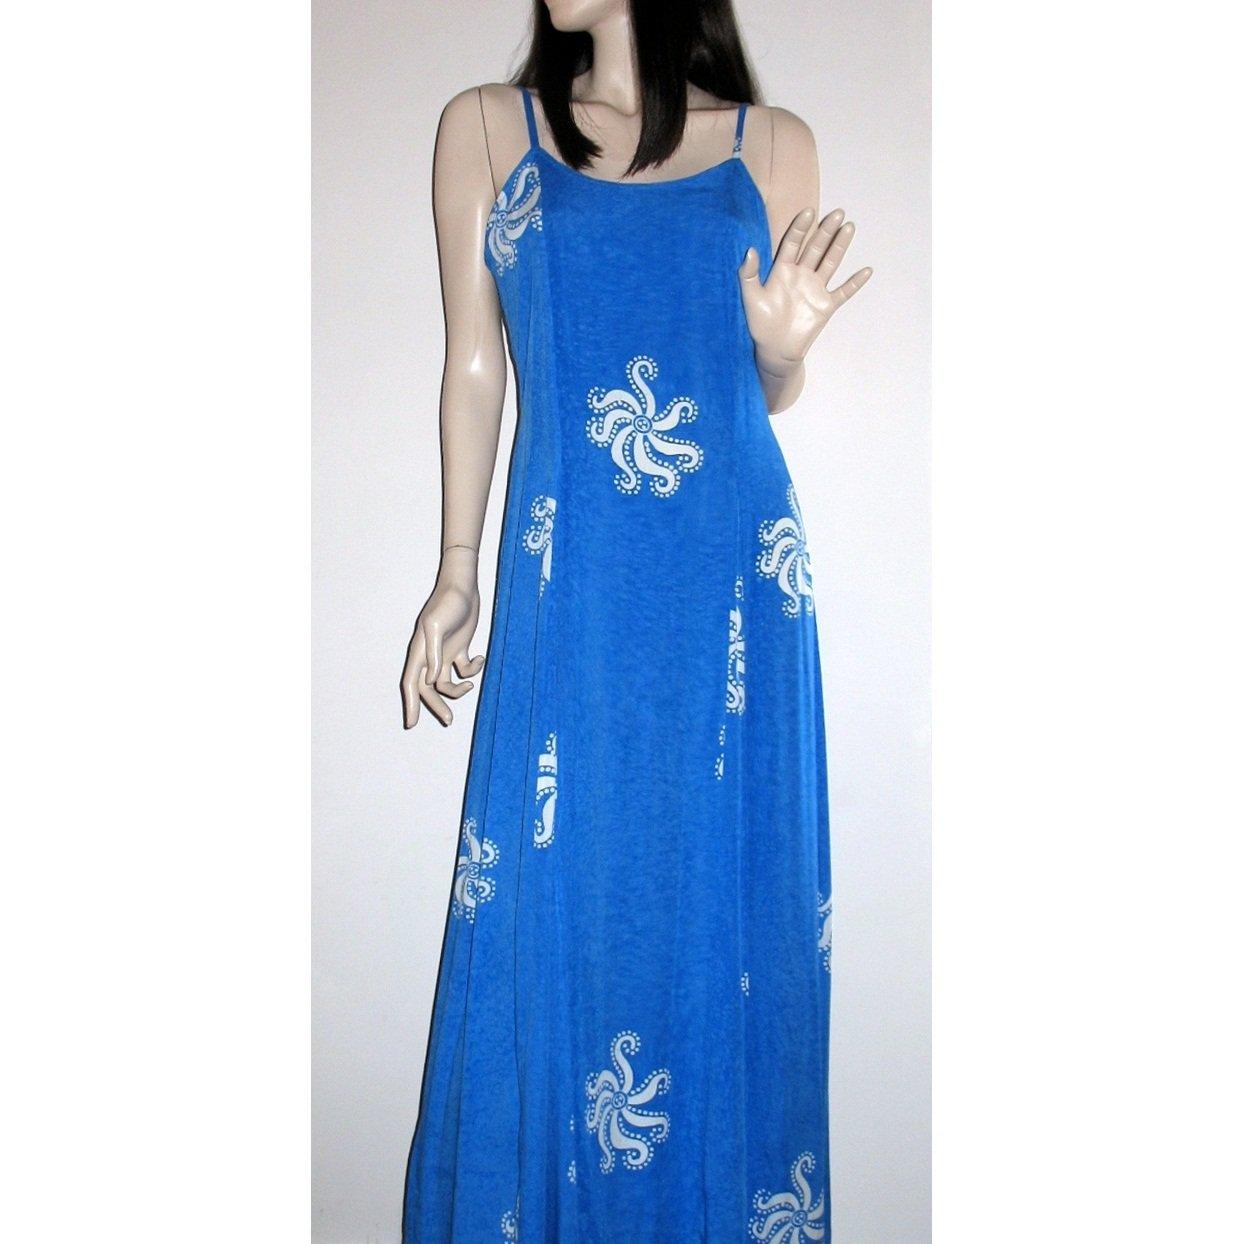 Vintage Slip Dress Sundress Long Length Maxi Size S/Small